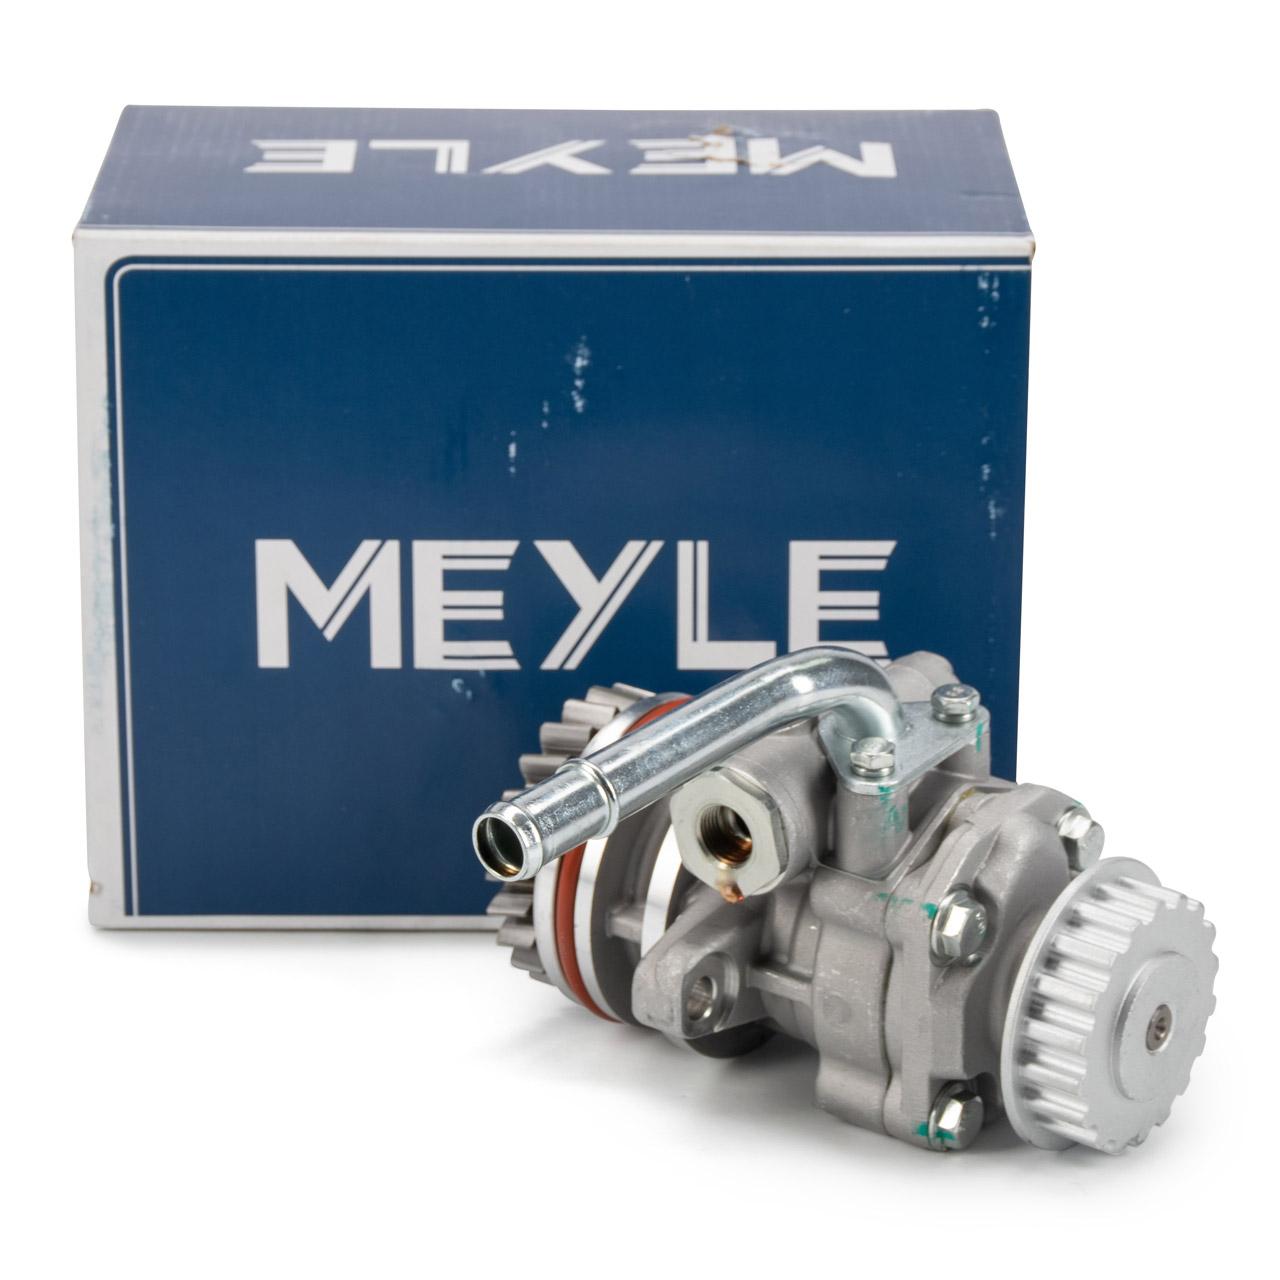 MEYLE Servolenkungspumpe Servopumpe Hydraulikpumpe VW T5 Touareg 7L 2.5 TDI 7H0422153H